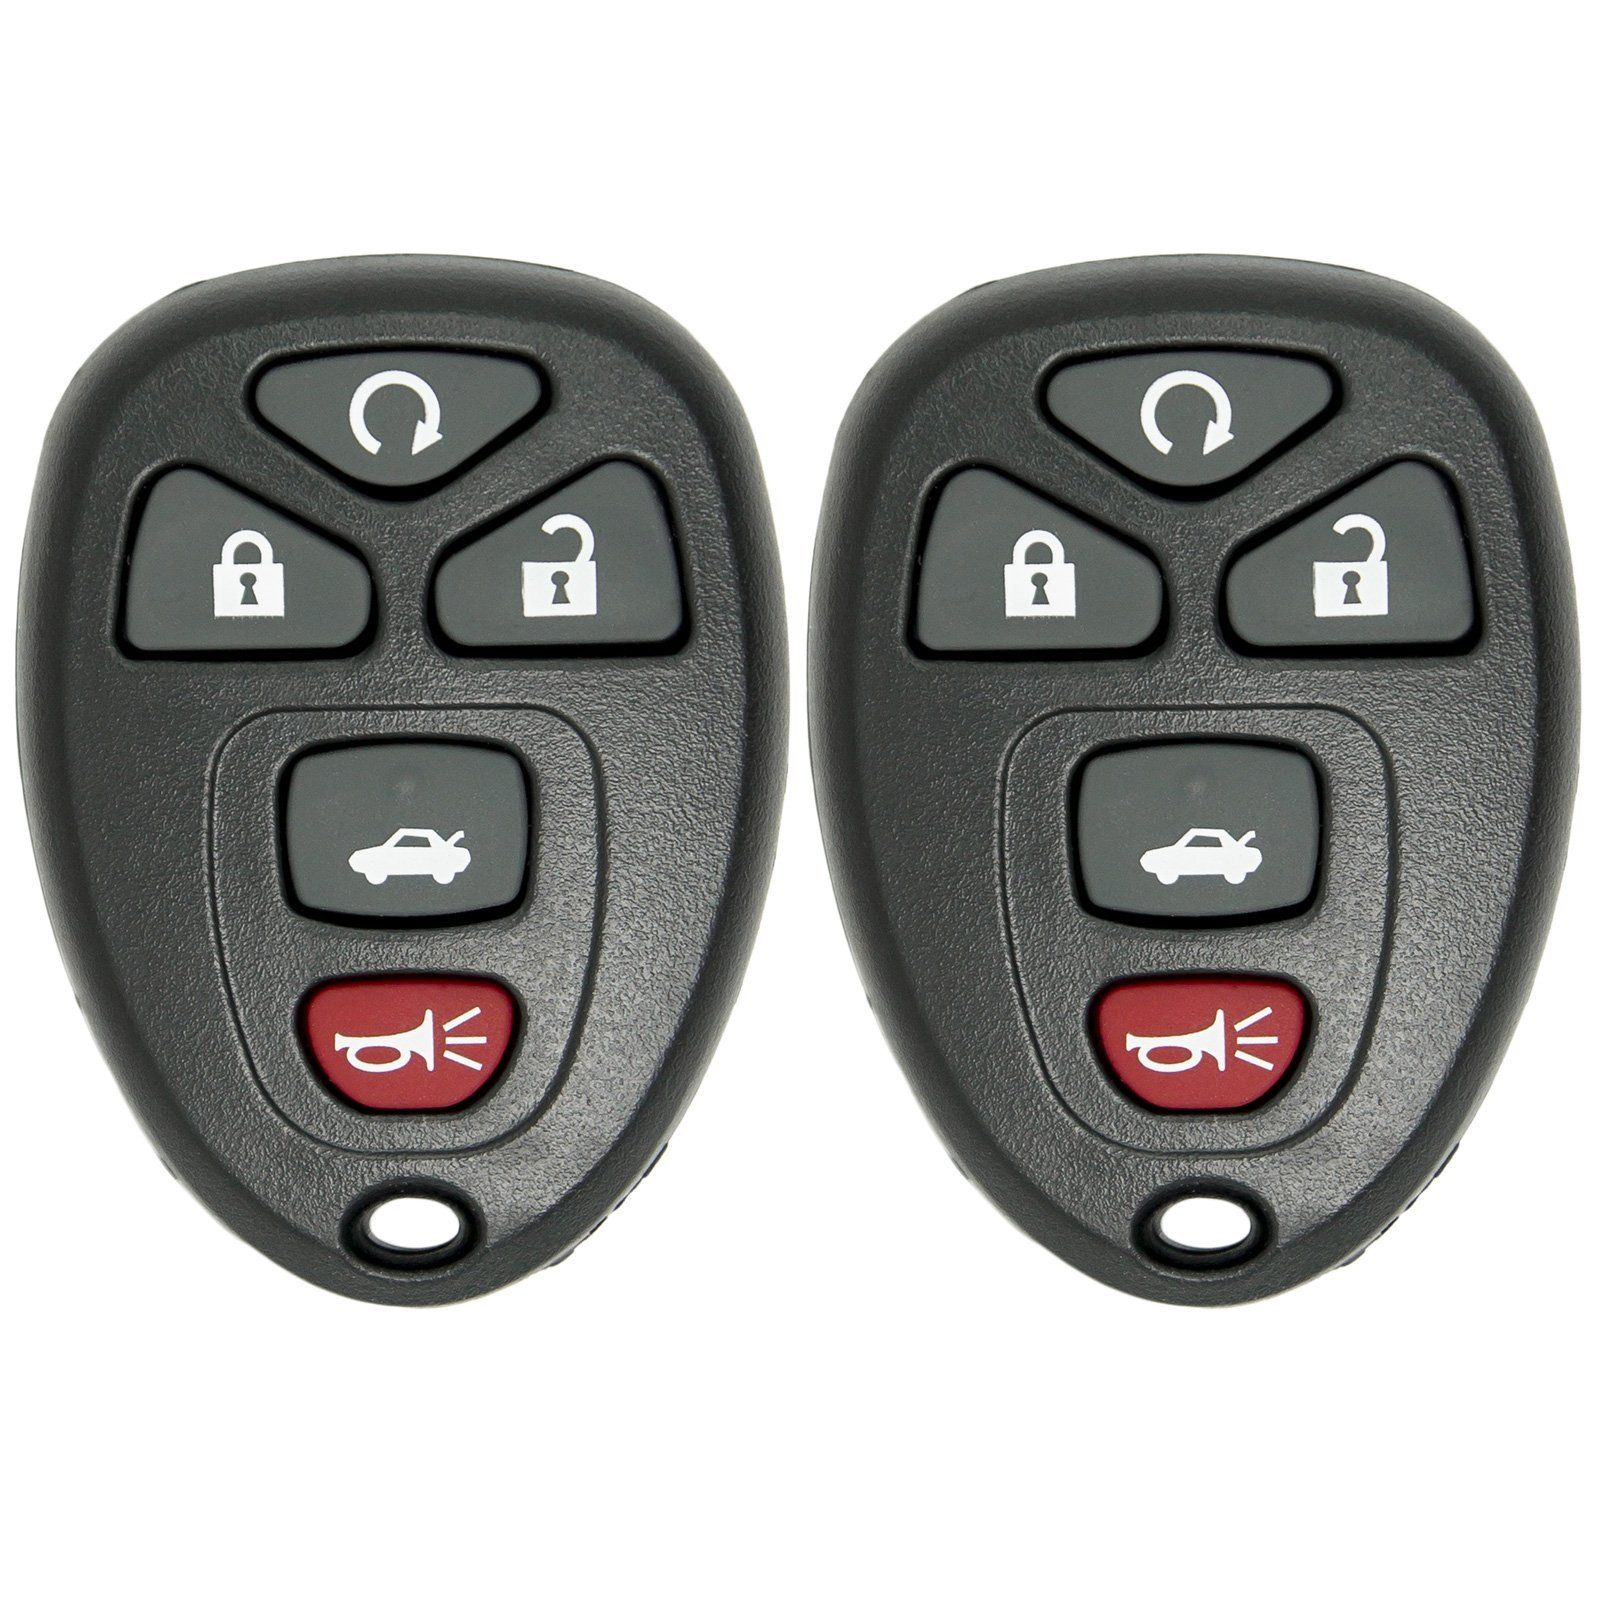 2 keyless2go new replacement keyless entry remote start